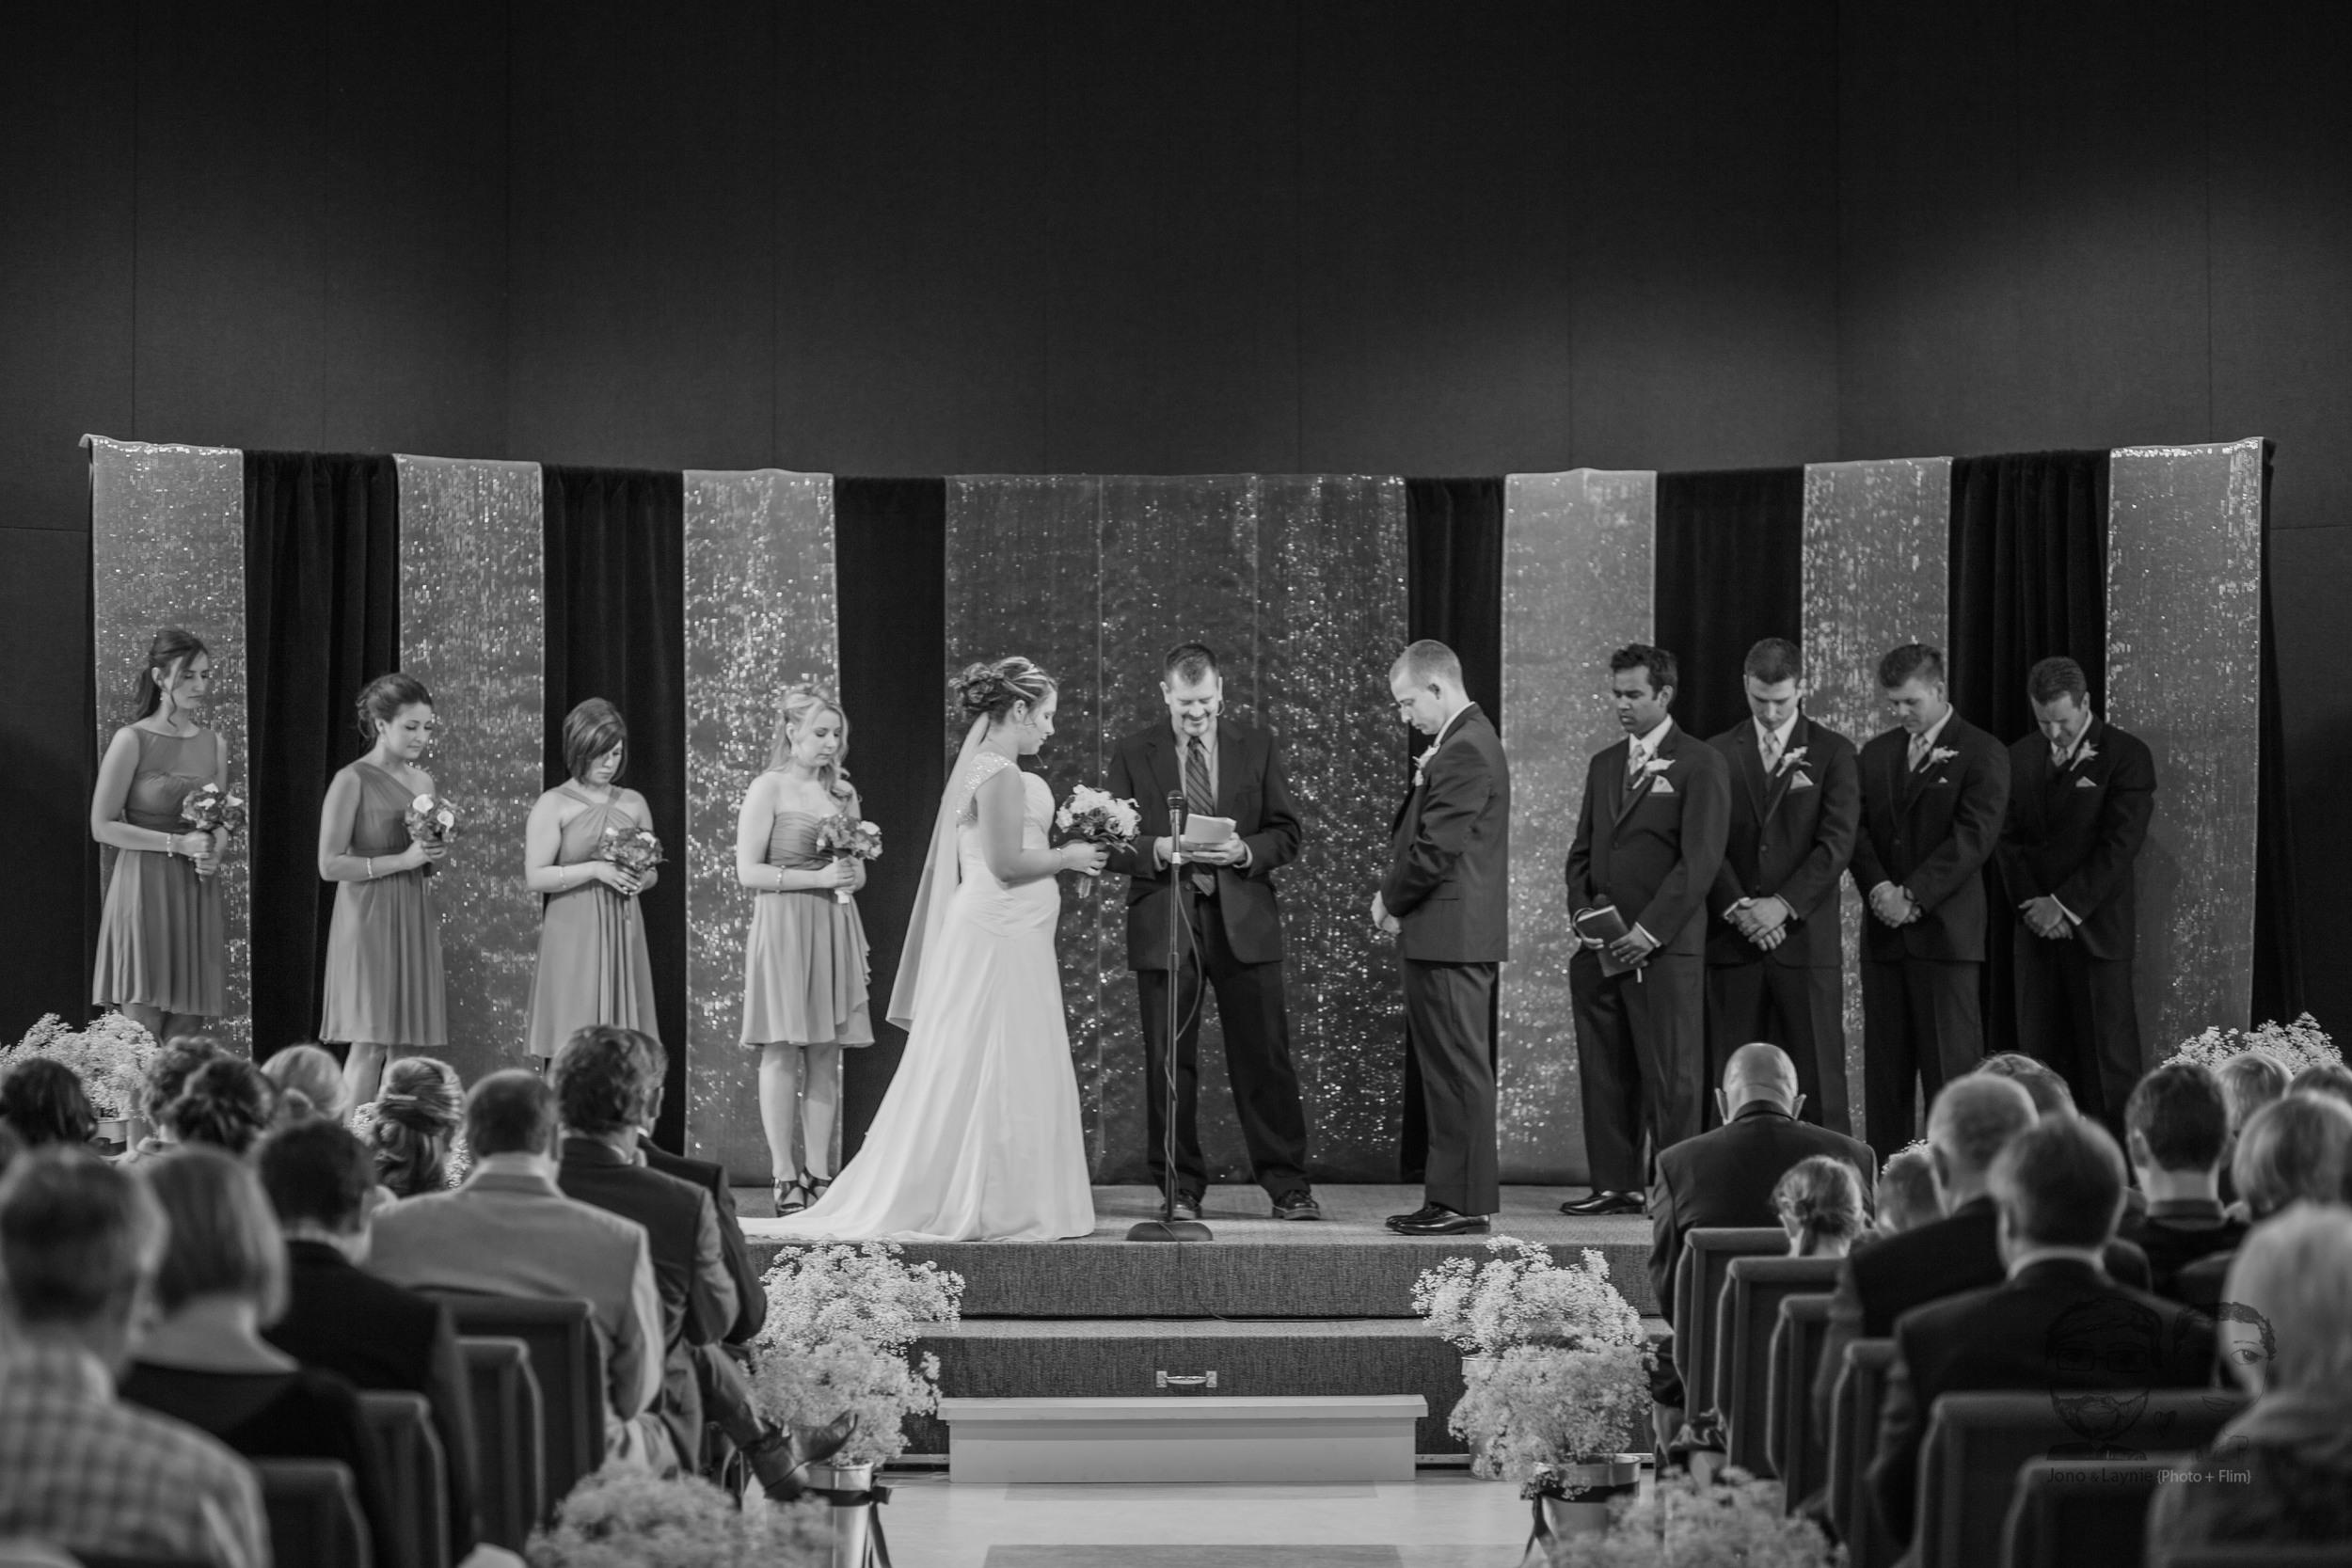 14Toronto Wedding Photographers and Videographers-Jono & Laynie Co.-Orangeville Wedding.jpg